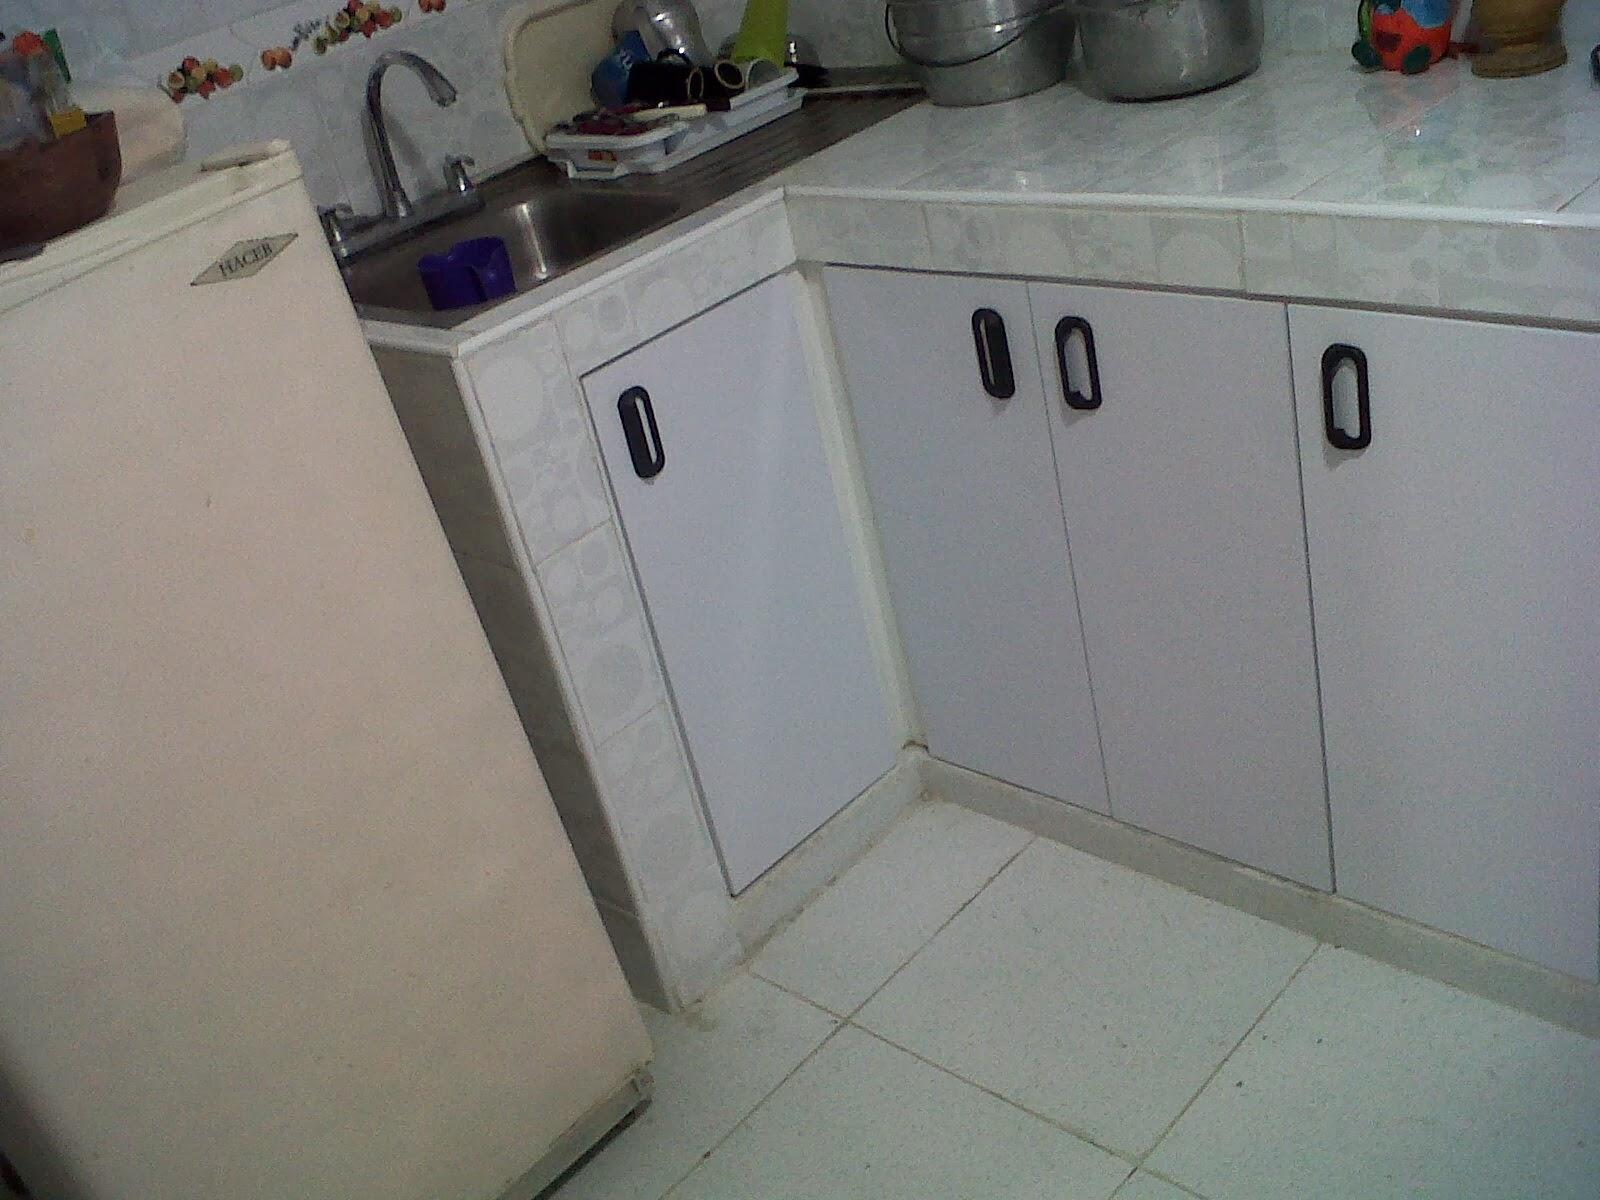 Reparaci n remodelaci n e instalaci n de cocinas - Instalacion de cocinas integrales ...